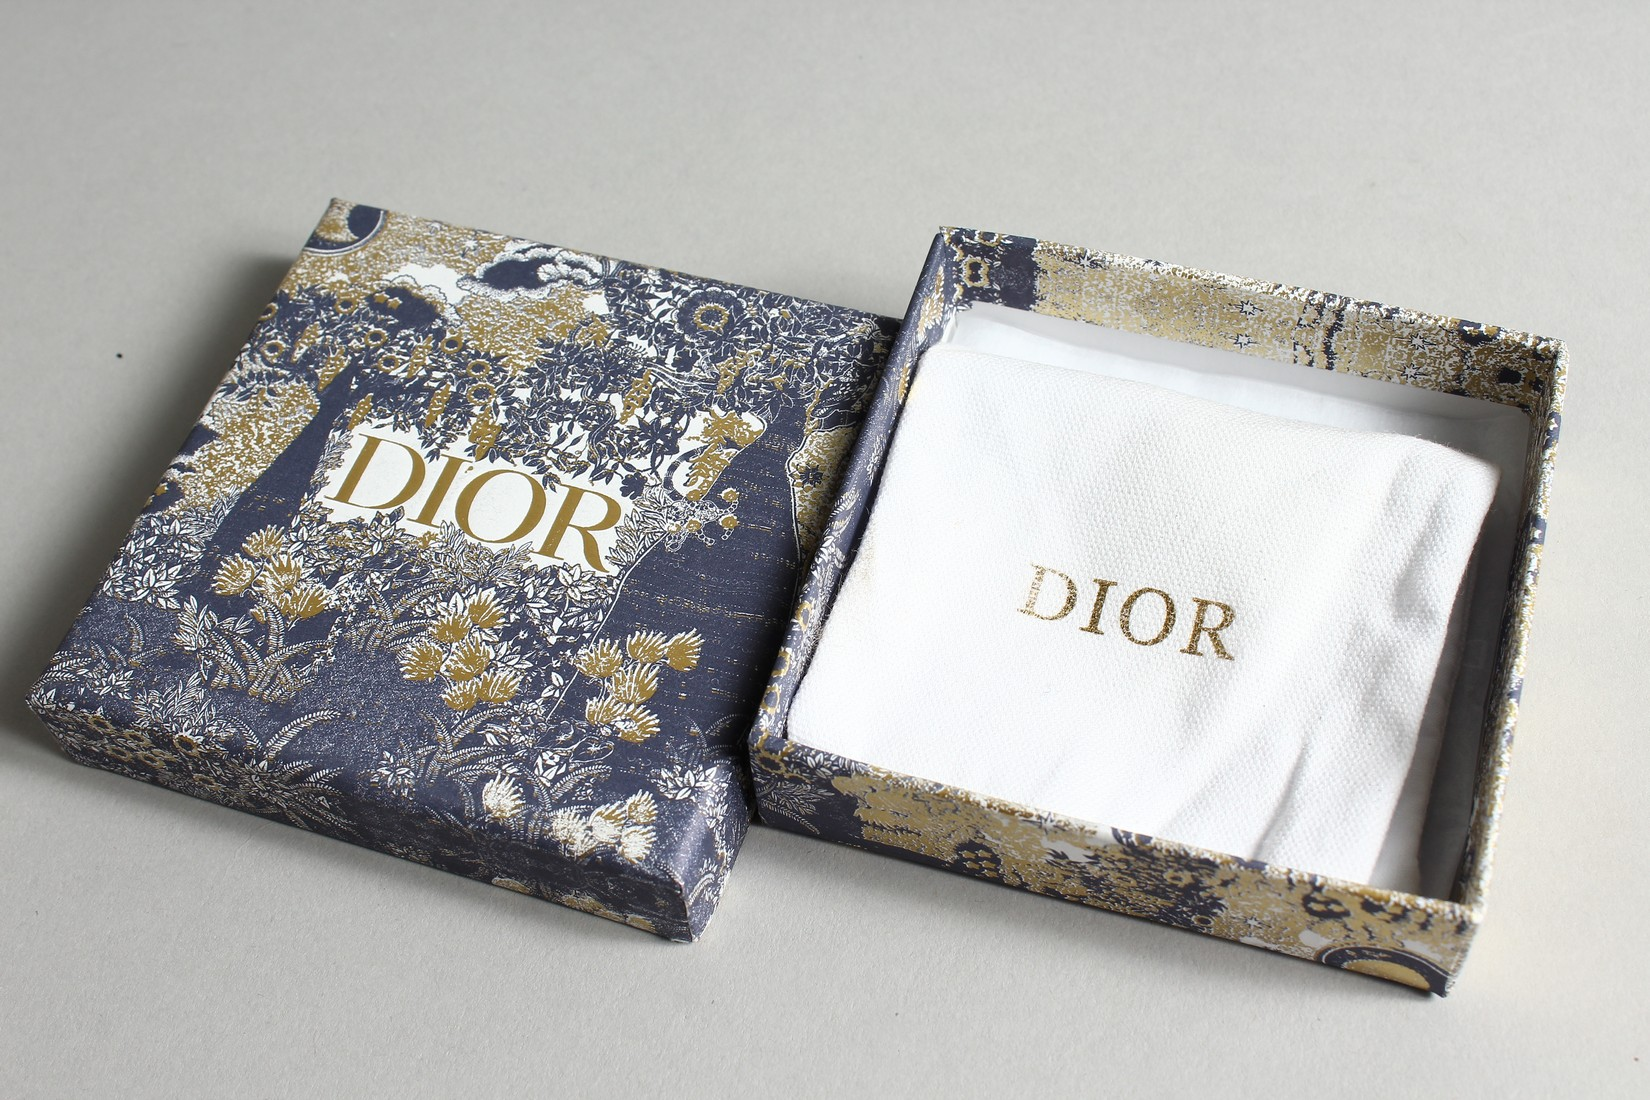 A DIOR JADIOR ELEPHANT BROOCH in a Dior bag and box. - Image 5 of 5